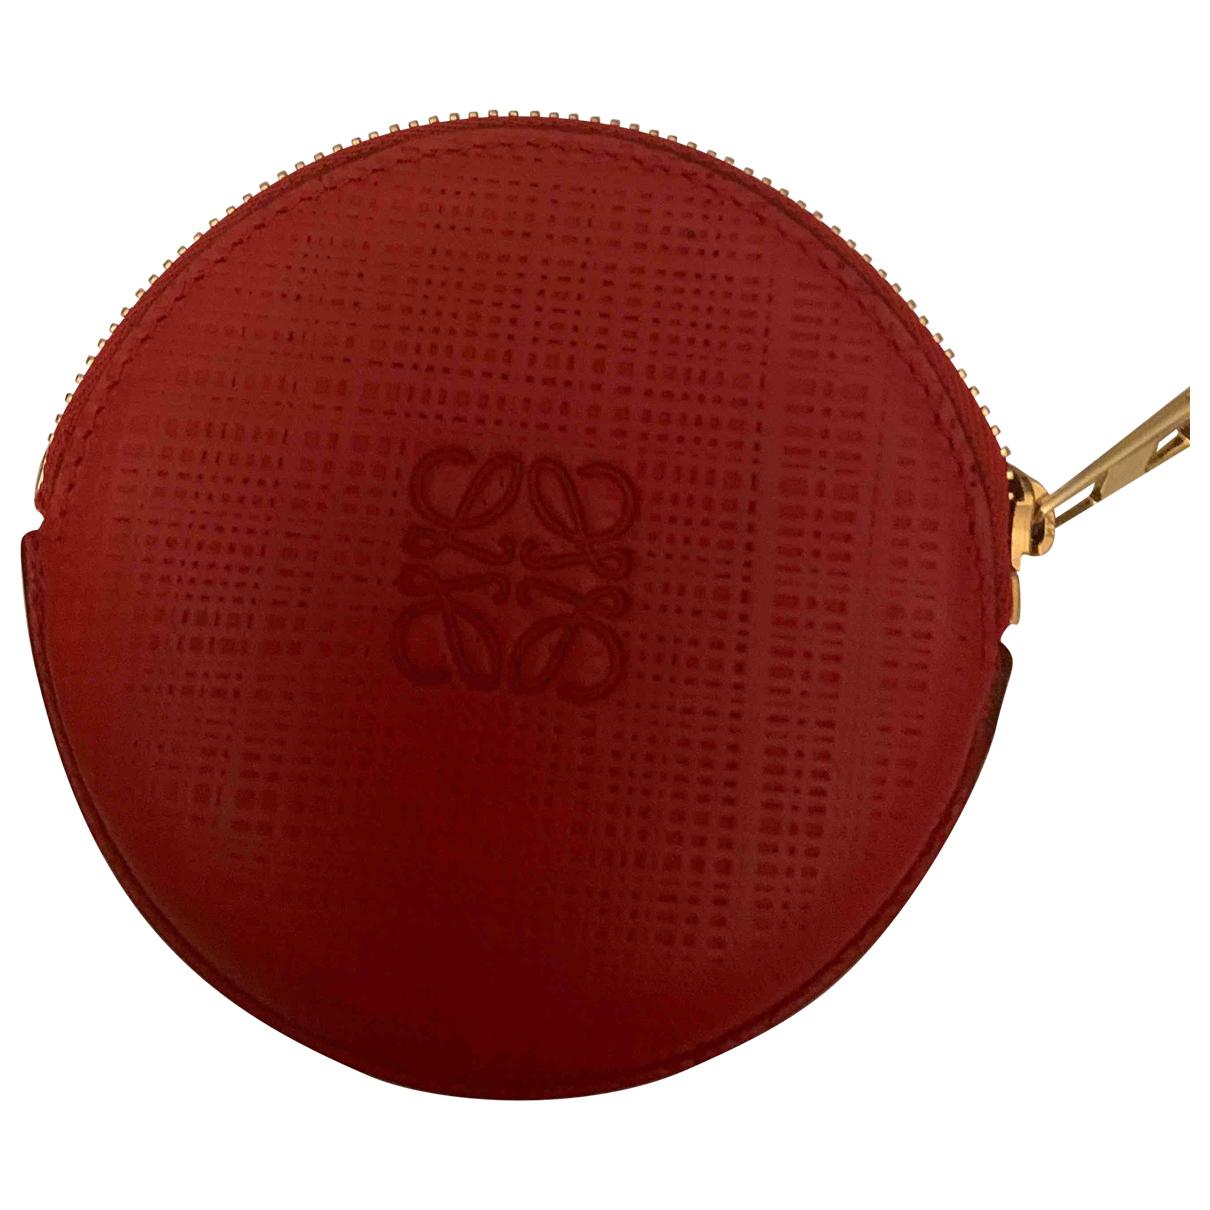 Loewe \N Red Leather Purses, wallet & cases for Women \N